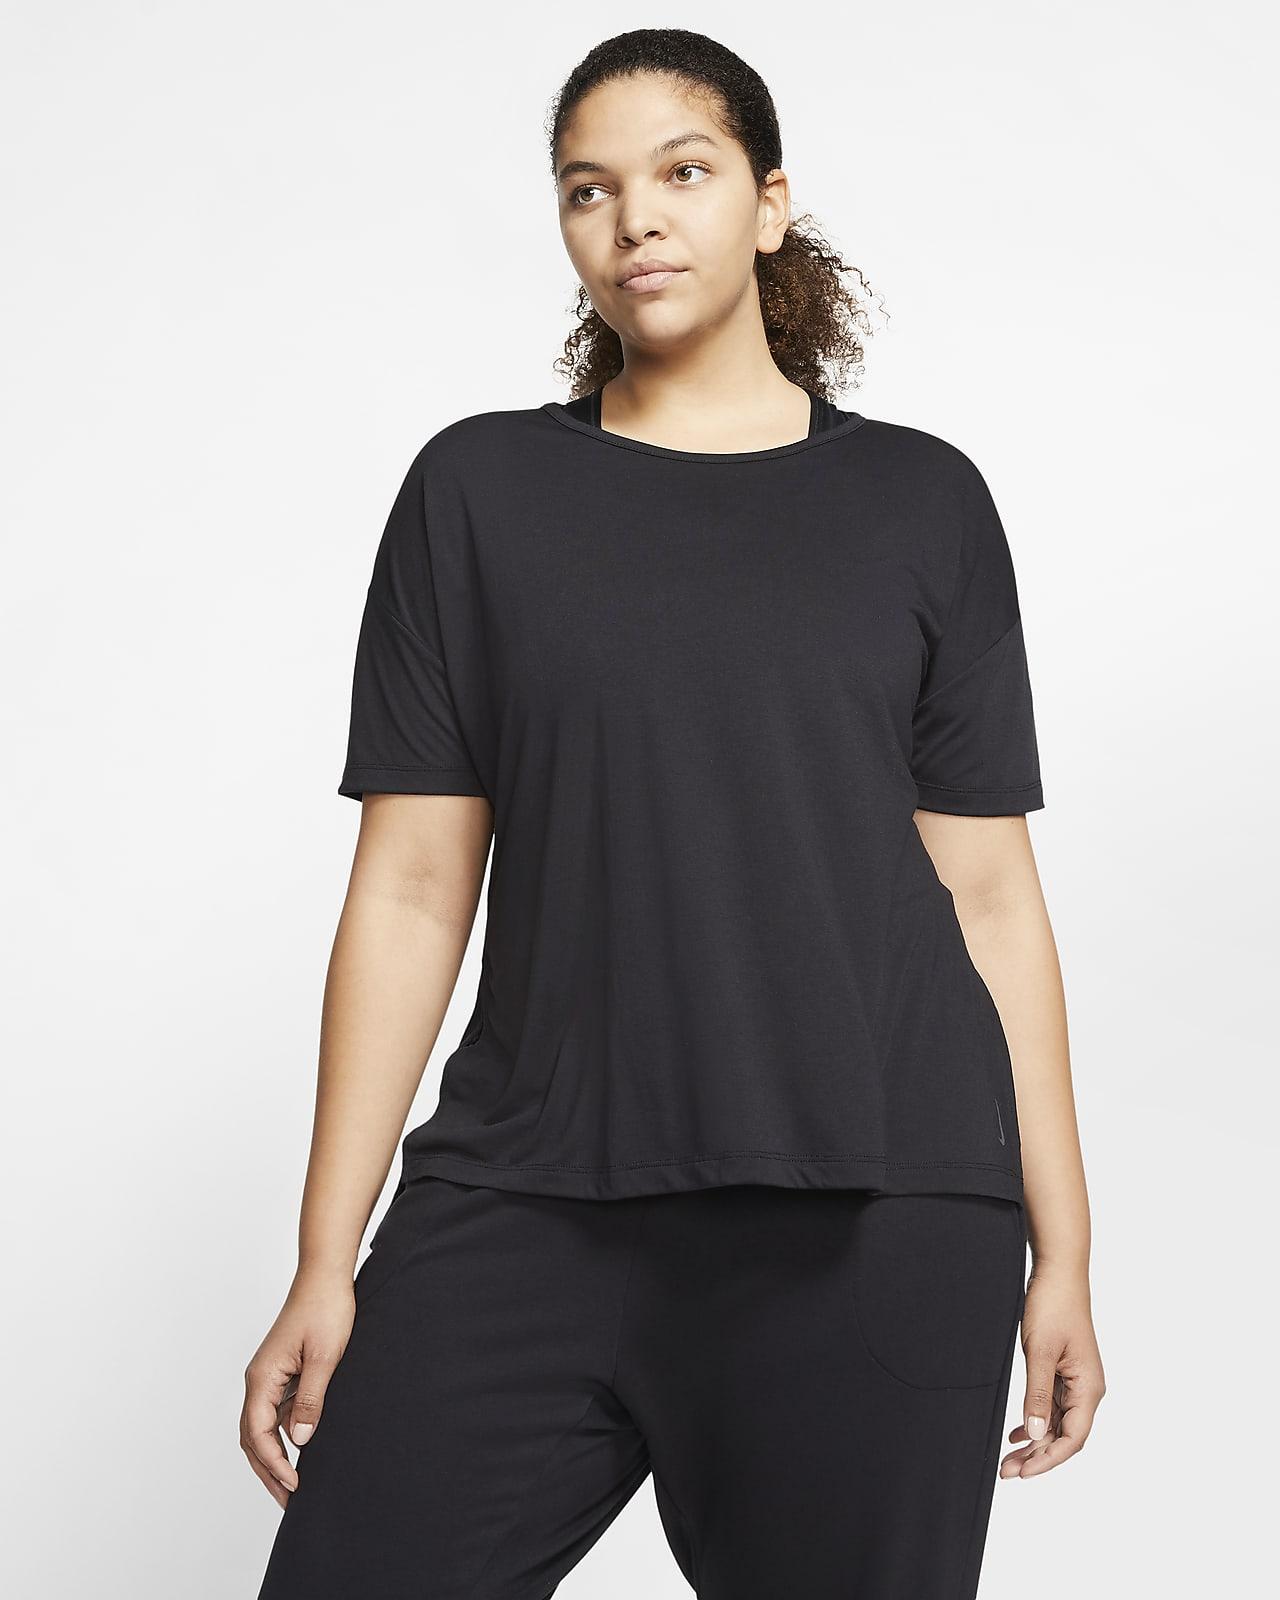 bita klippbok Lergods  Kortärmad tröja Nike Yoga för kvinnor (stora storlekar). Nike SE